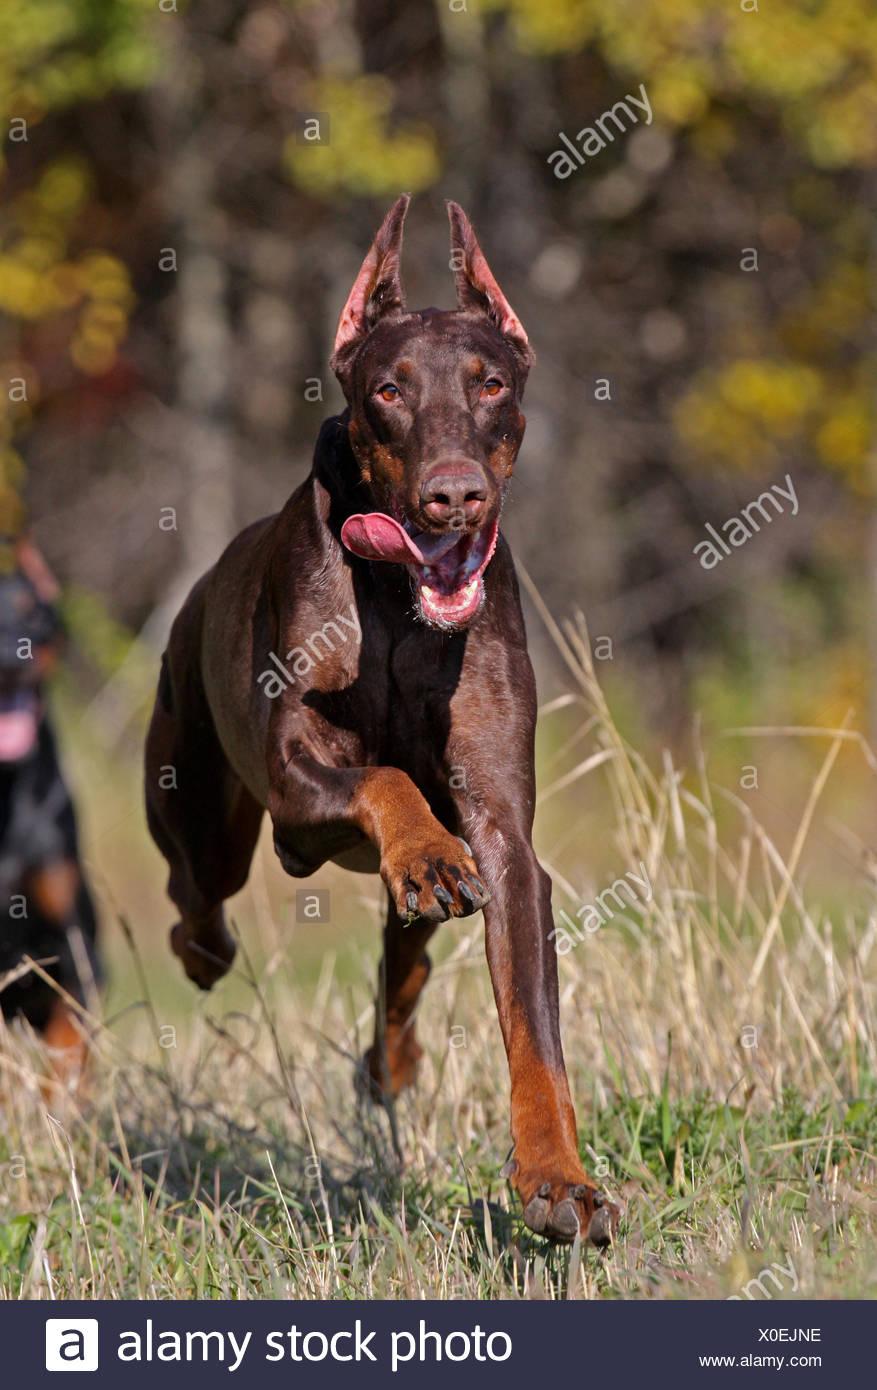 Running dog - Stock Image